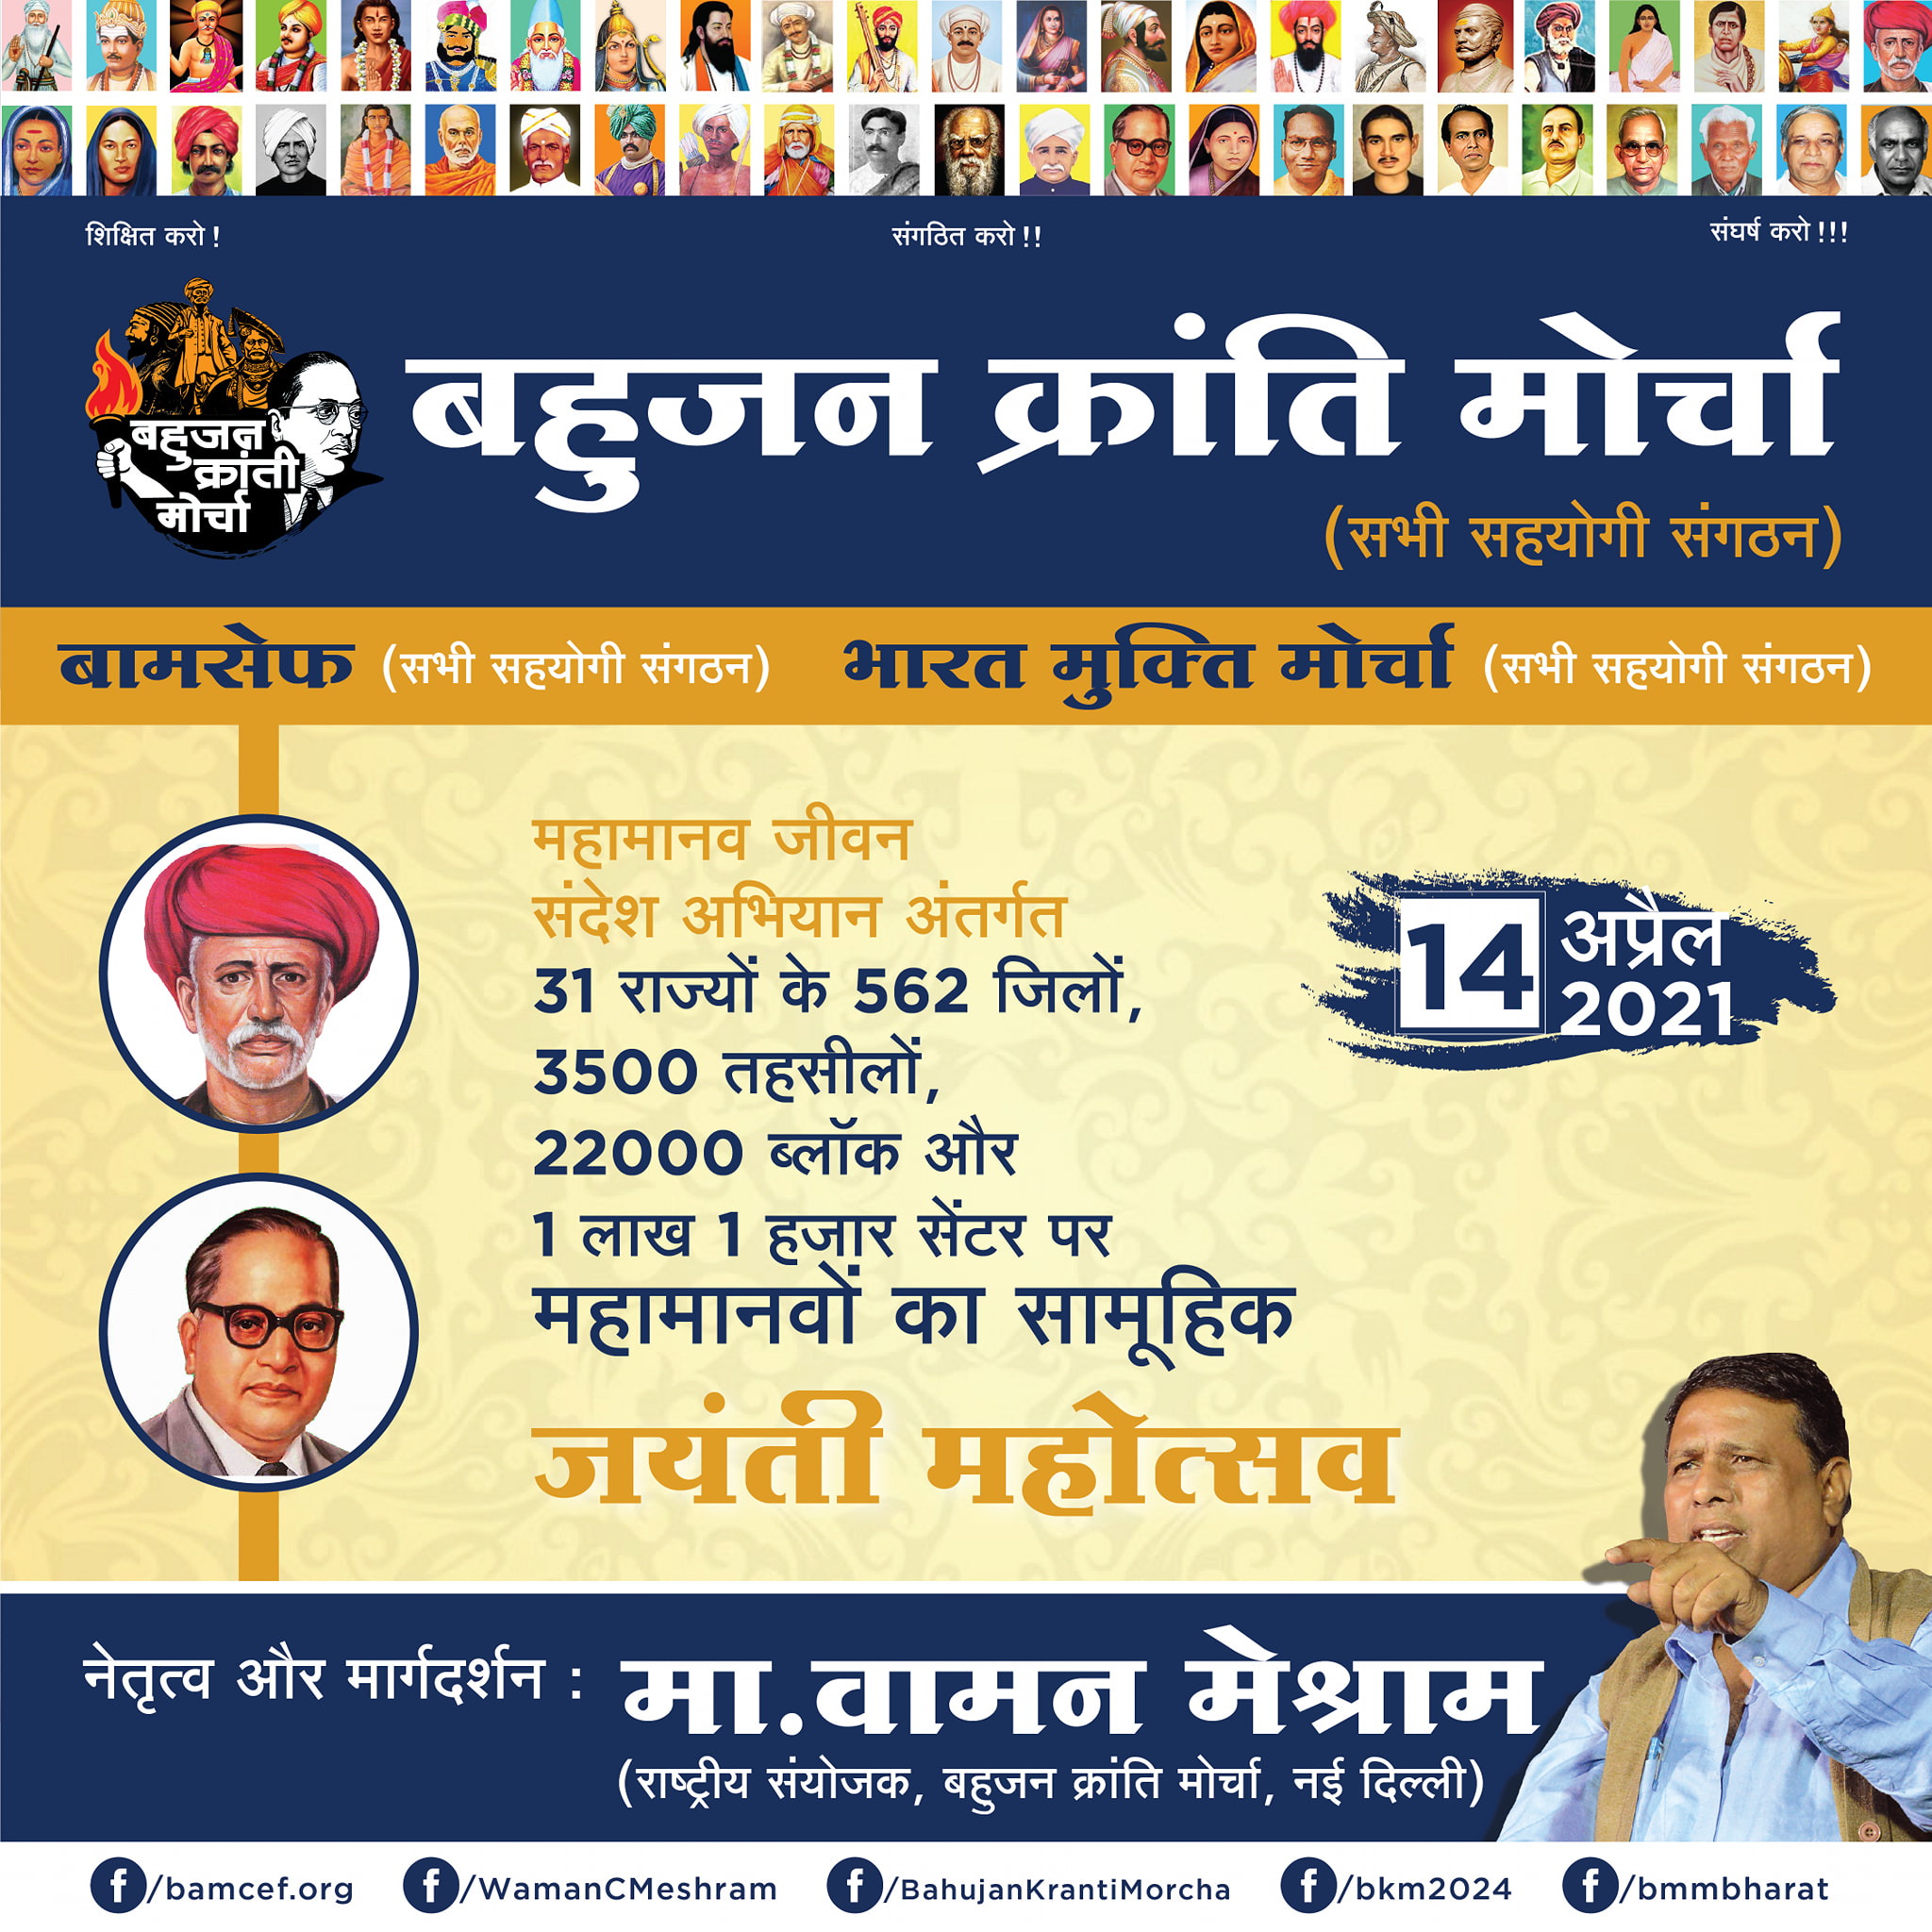 Bahujan Kranti Morcha organized Mahamanav Jayanti Mahotsav At 1 lakh 1 thousand center…14 April 2021.